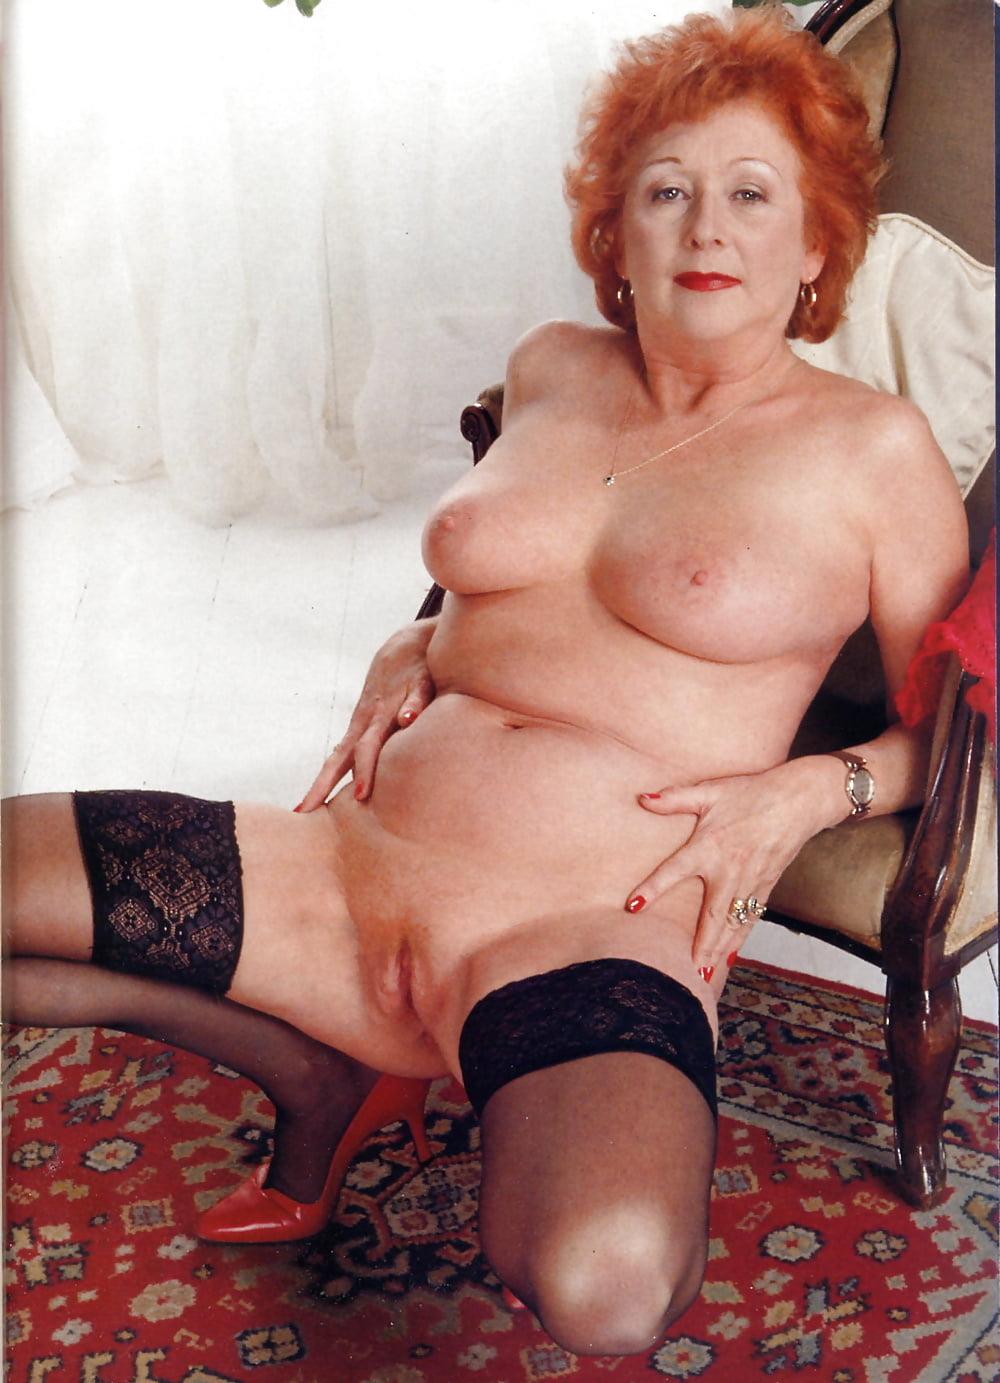 Glamour grandma porn, girls nude high heels